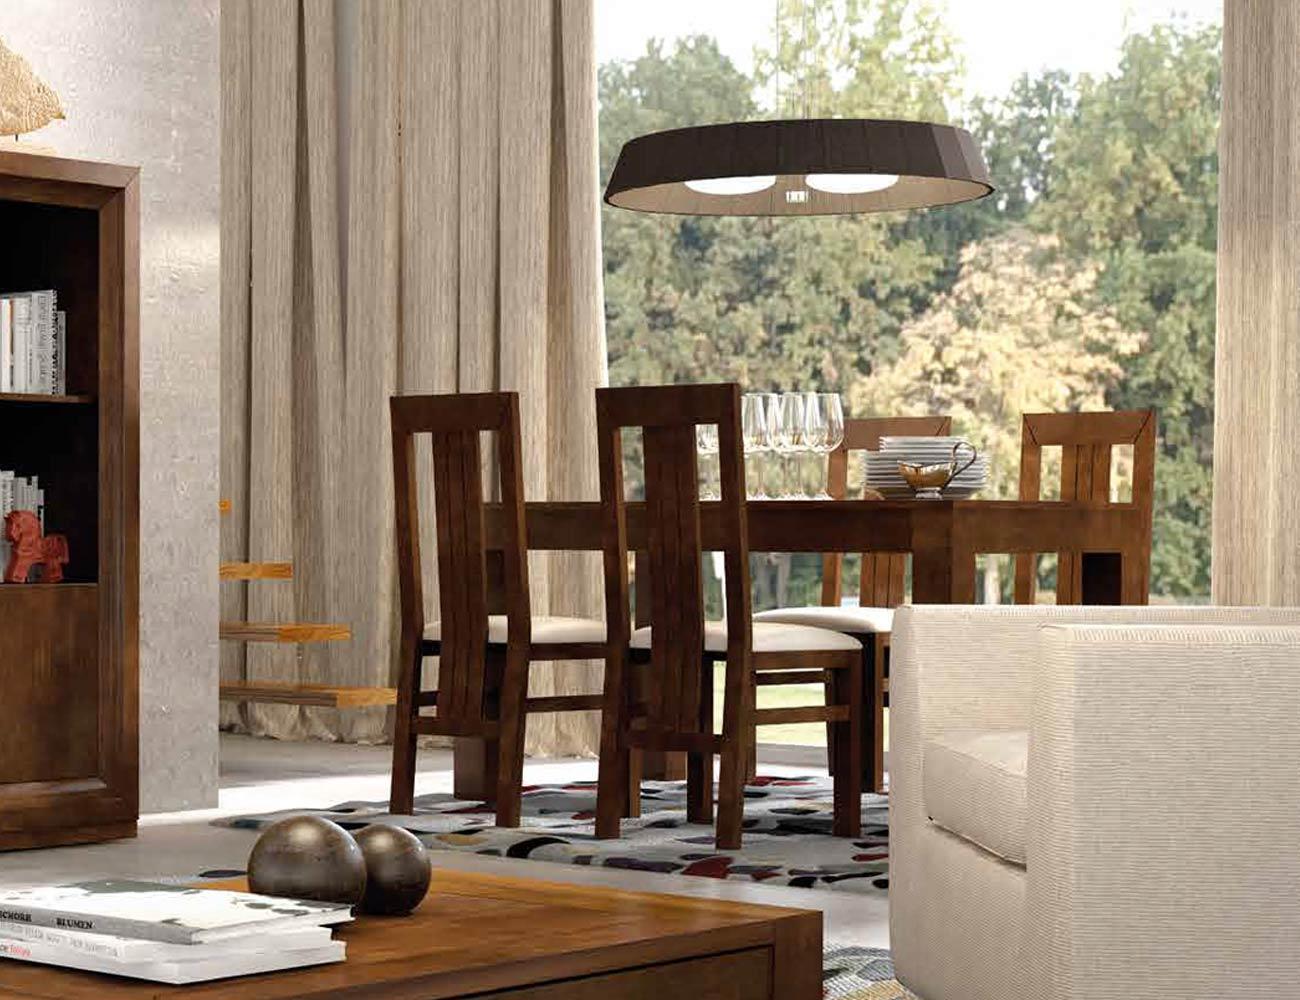 Mesa sillas composicion 38